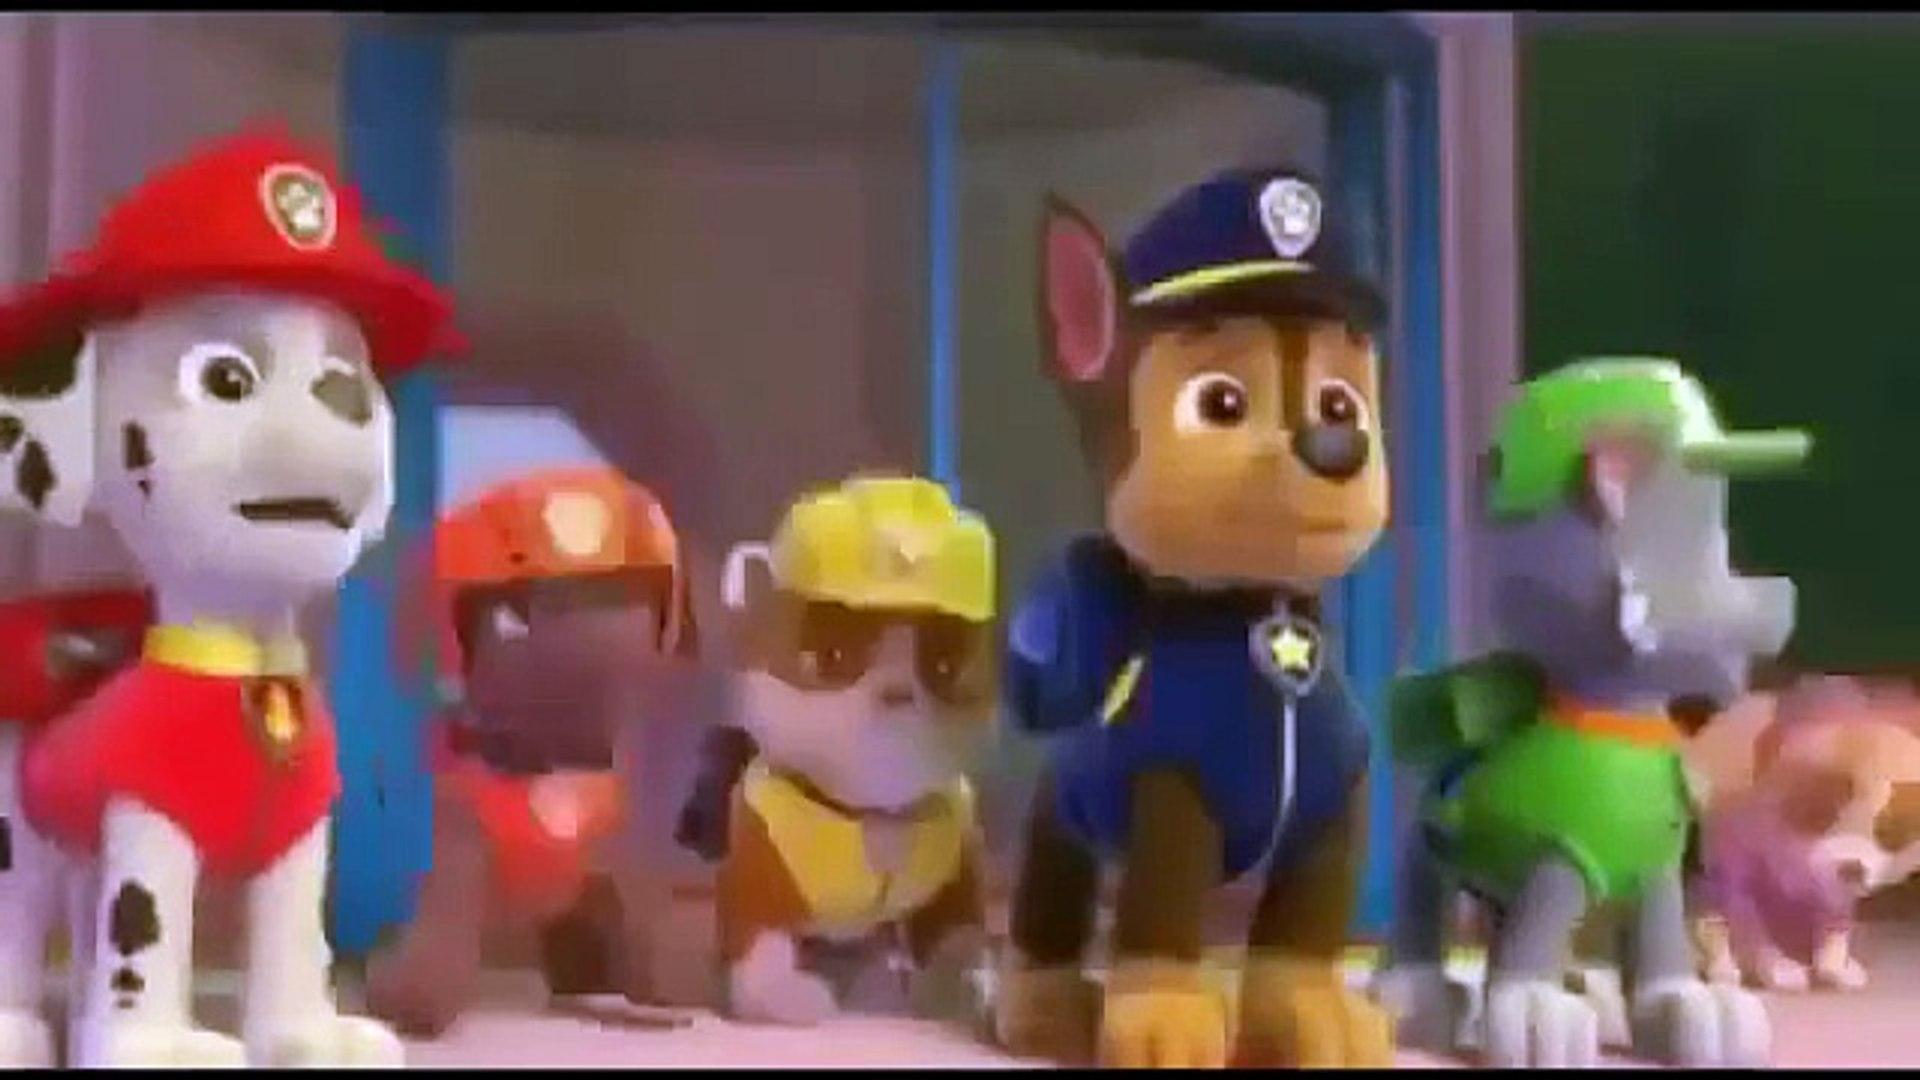 PAW Patrol Full Episodes - Best Cartoon For Kids Paw Patrol - Full Episodes HD 2015